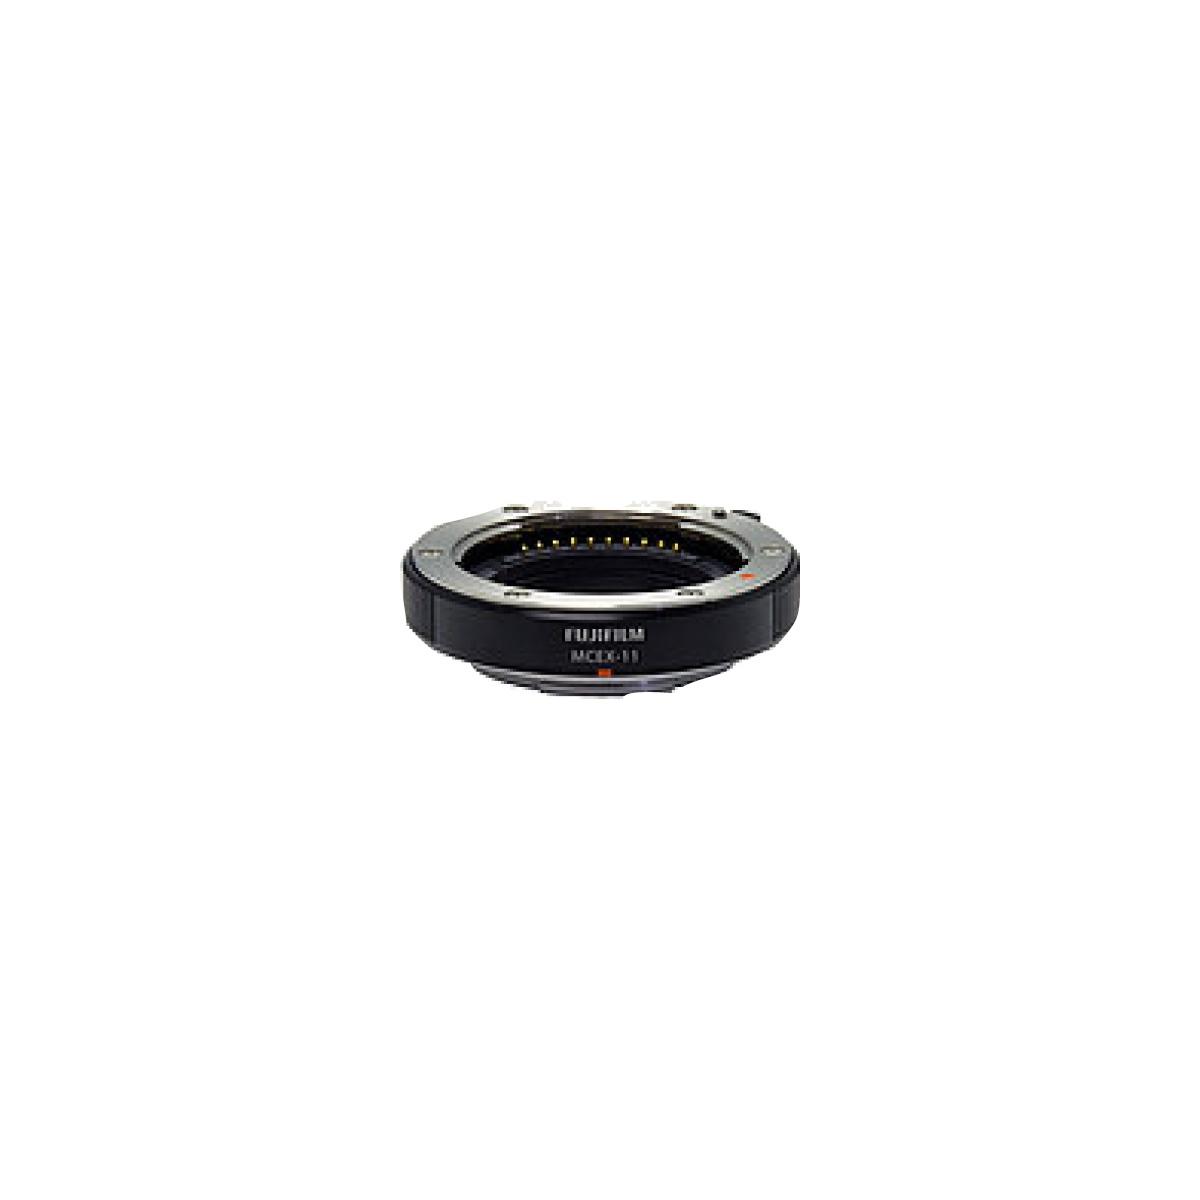 Fujifilm Makro-Zwischenring MCEX-11